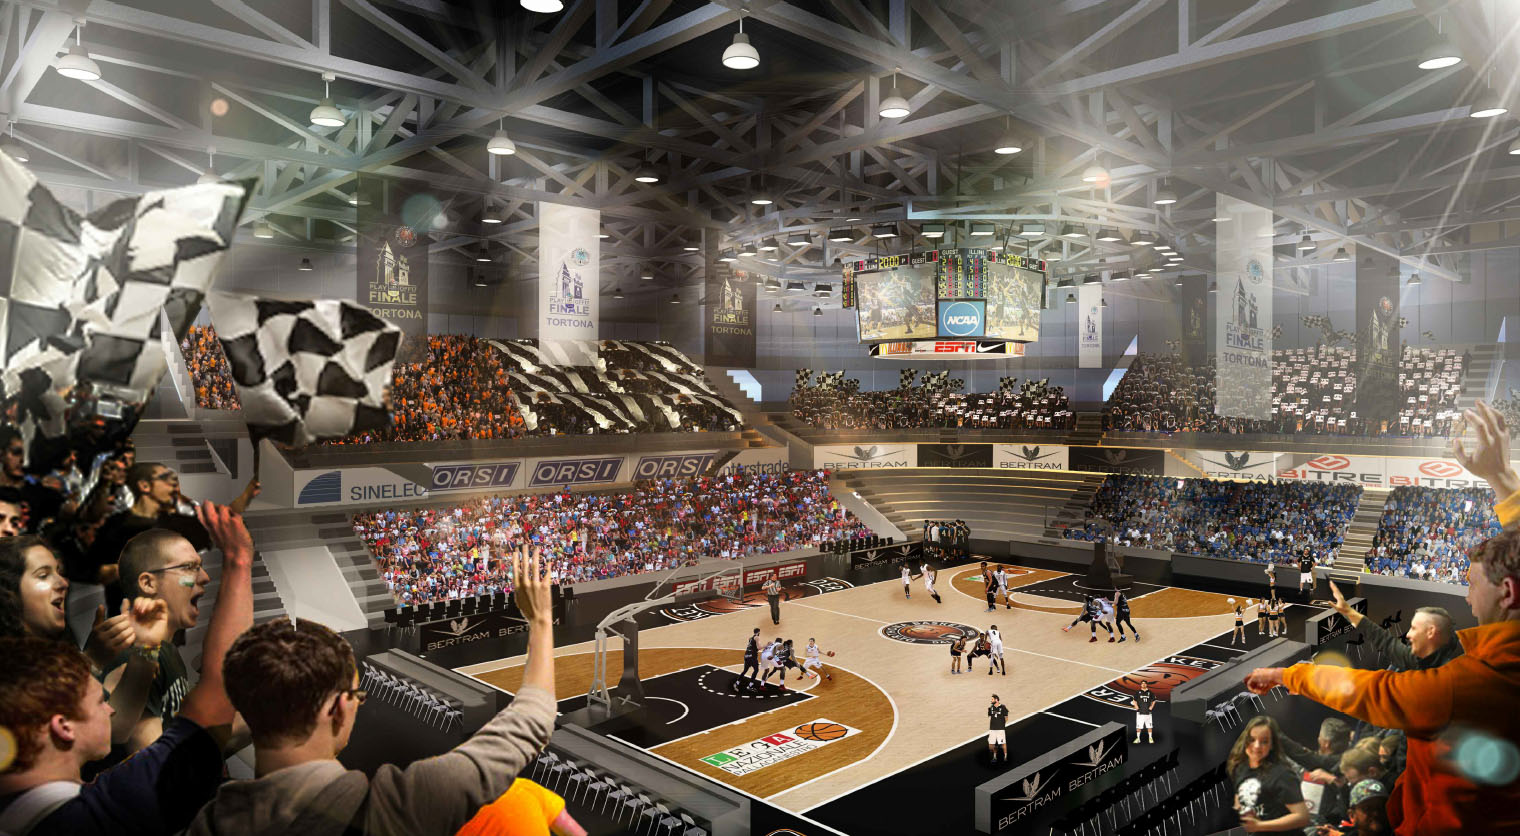 Bertram Arena Derthona